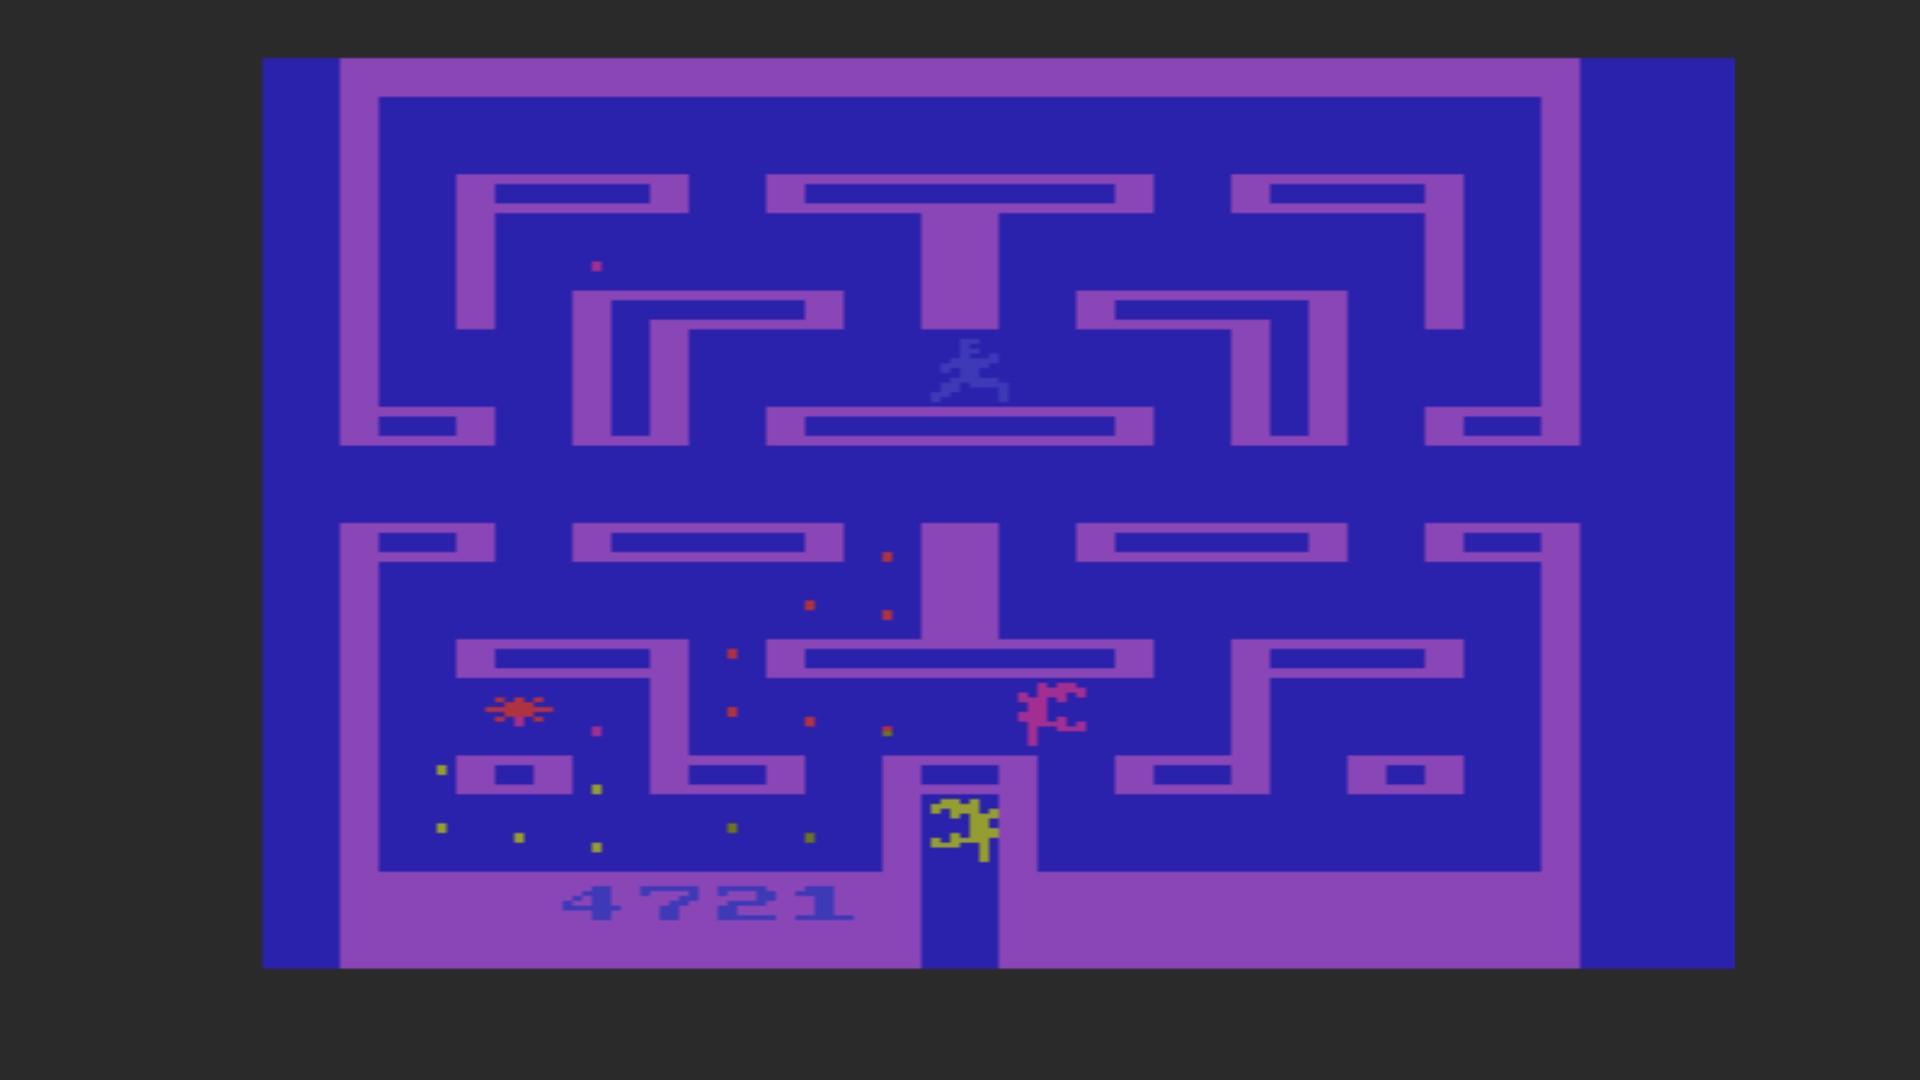 AkinNahtanoj: Alien (Atari 2600 Emulated Novice/B Mode) 4,721 points on 2020-10-09 05:22:39